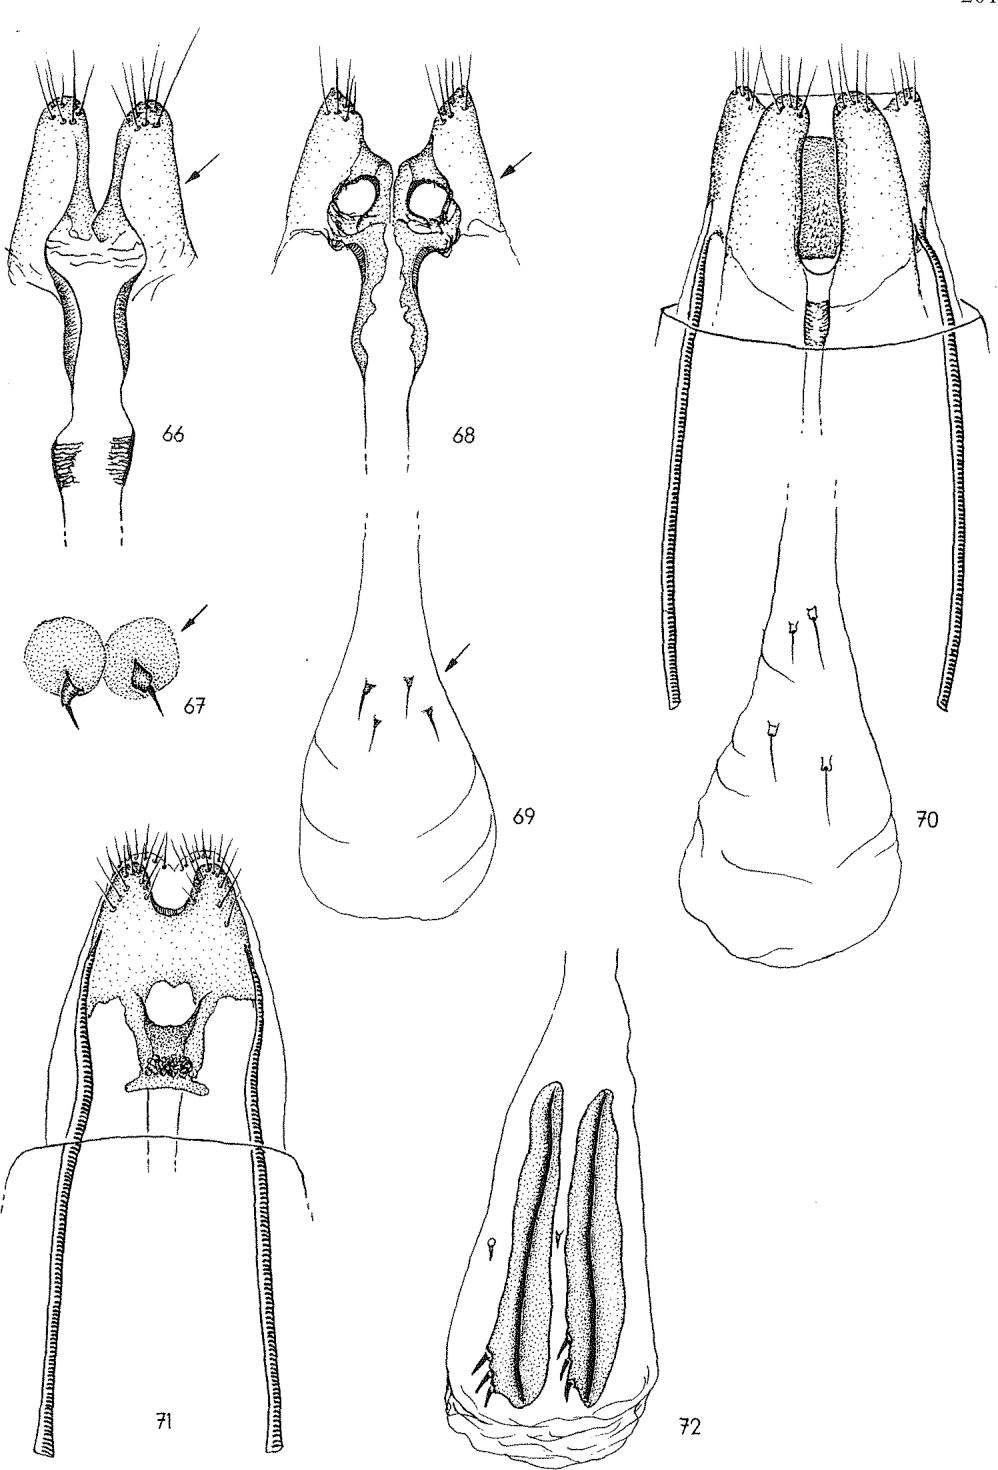 figure 66-67